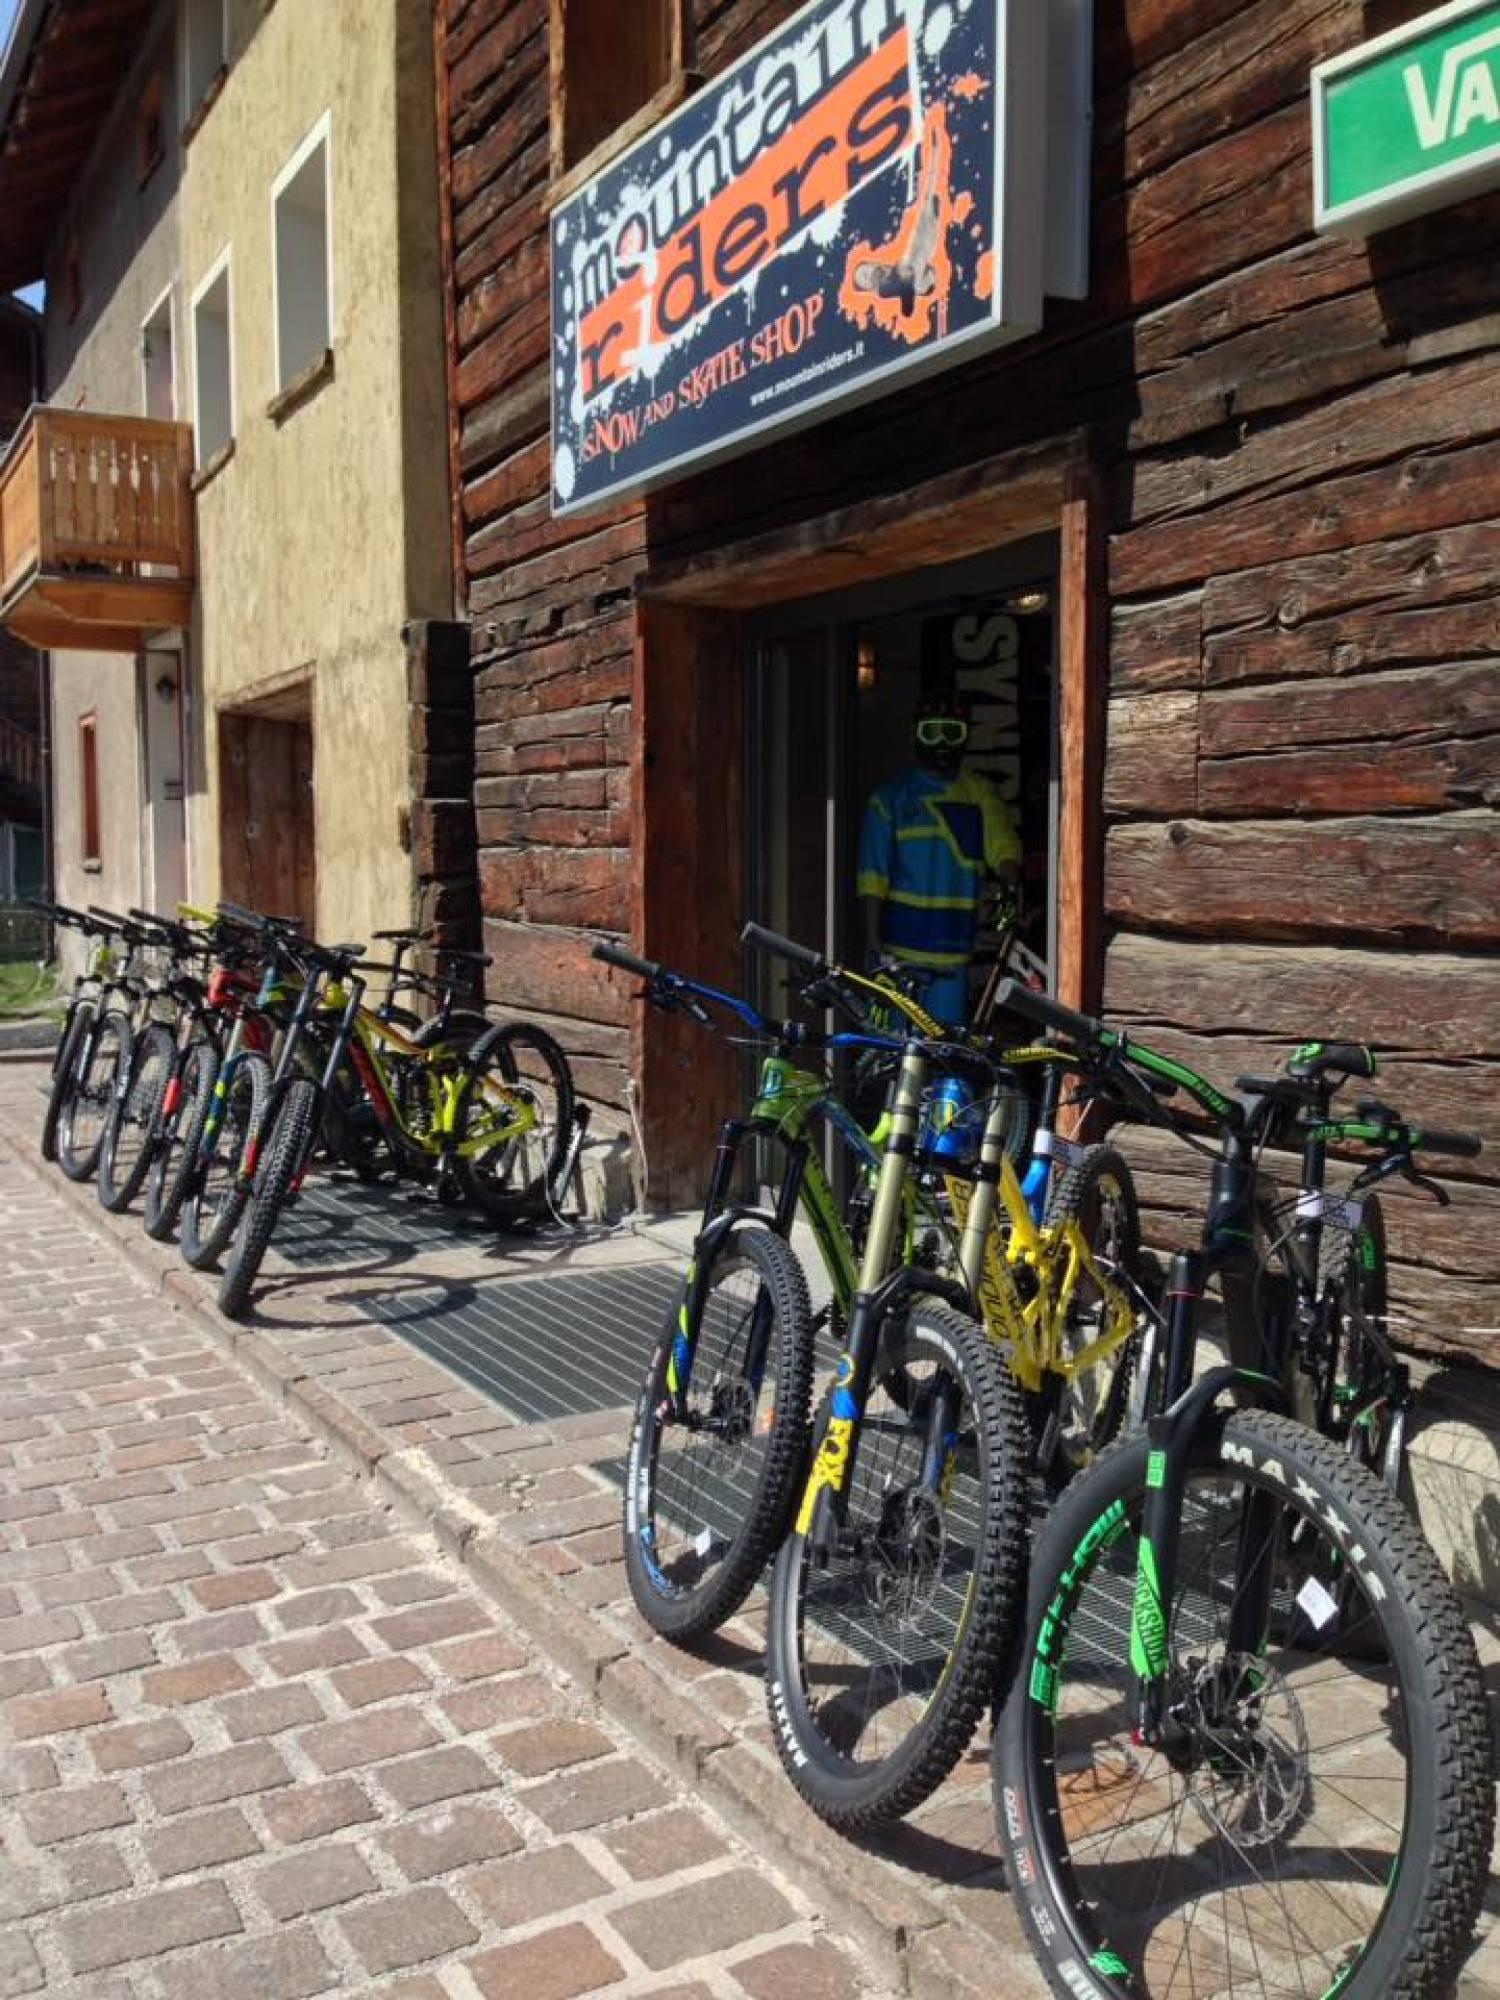 https://www.livignok.eu/Foto/Negozi/24/bici.jpg